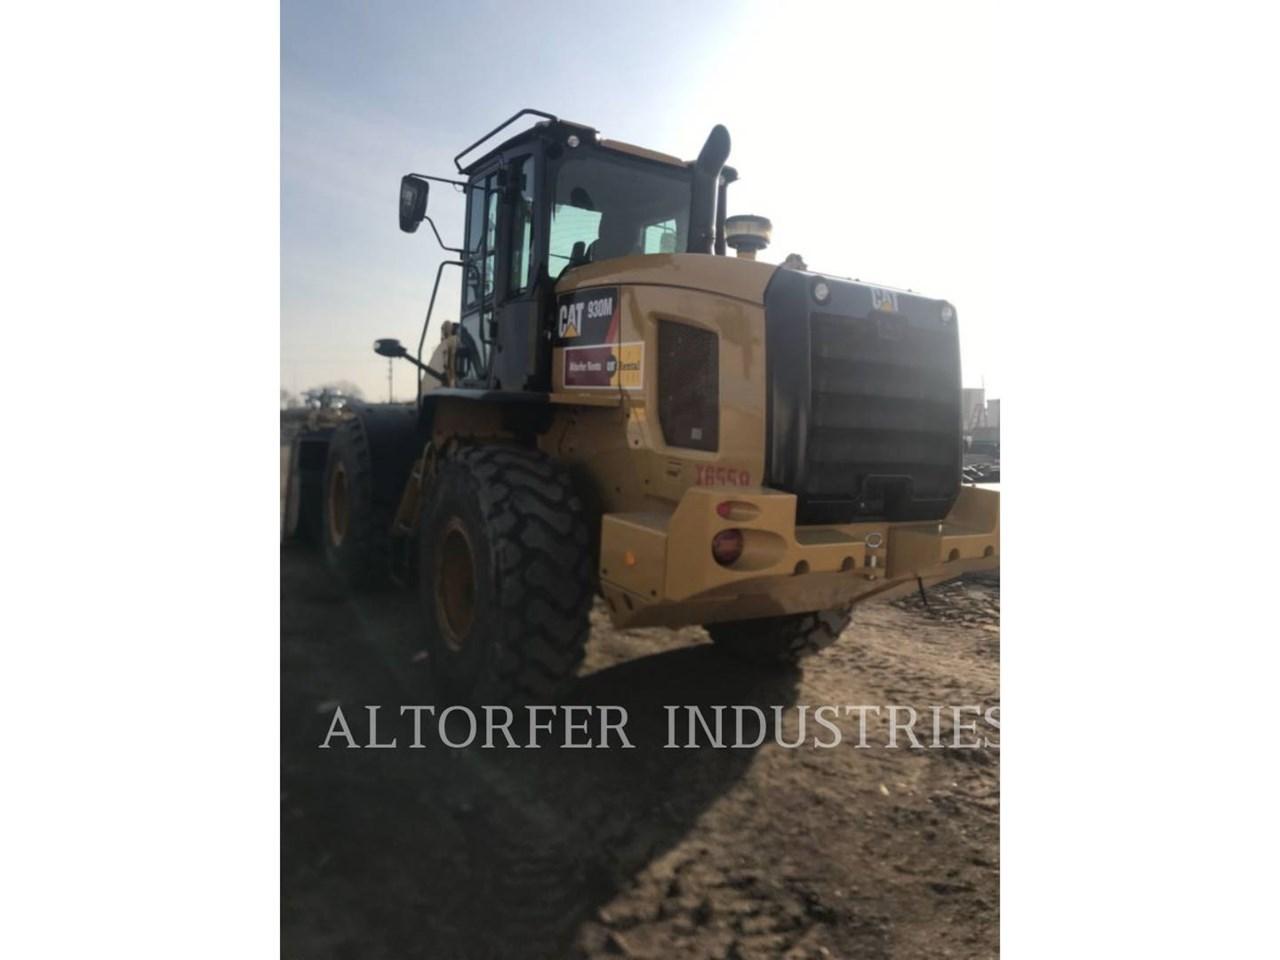 2019 Caterpillar 930M Image 4